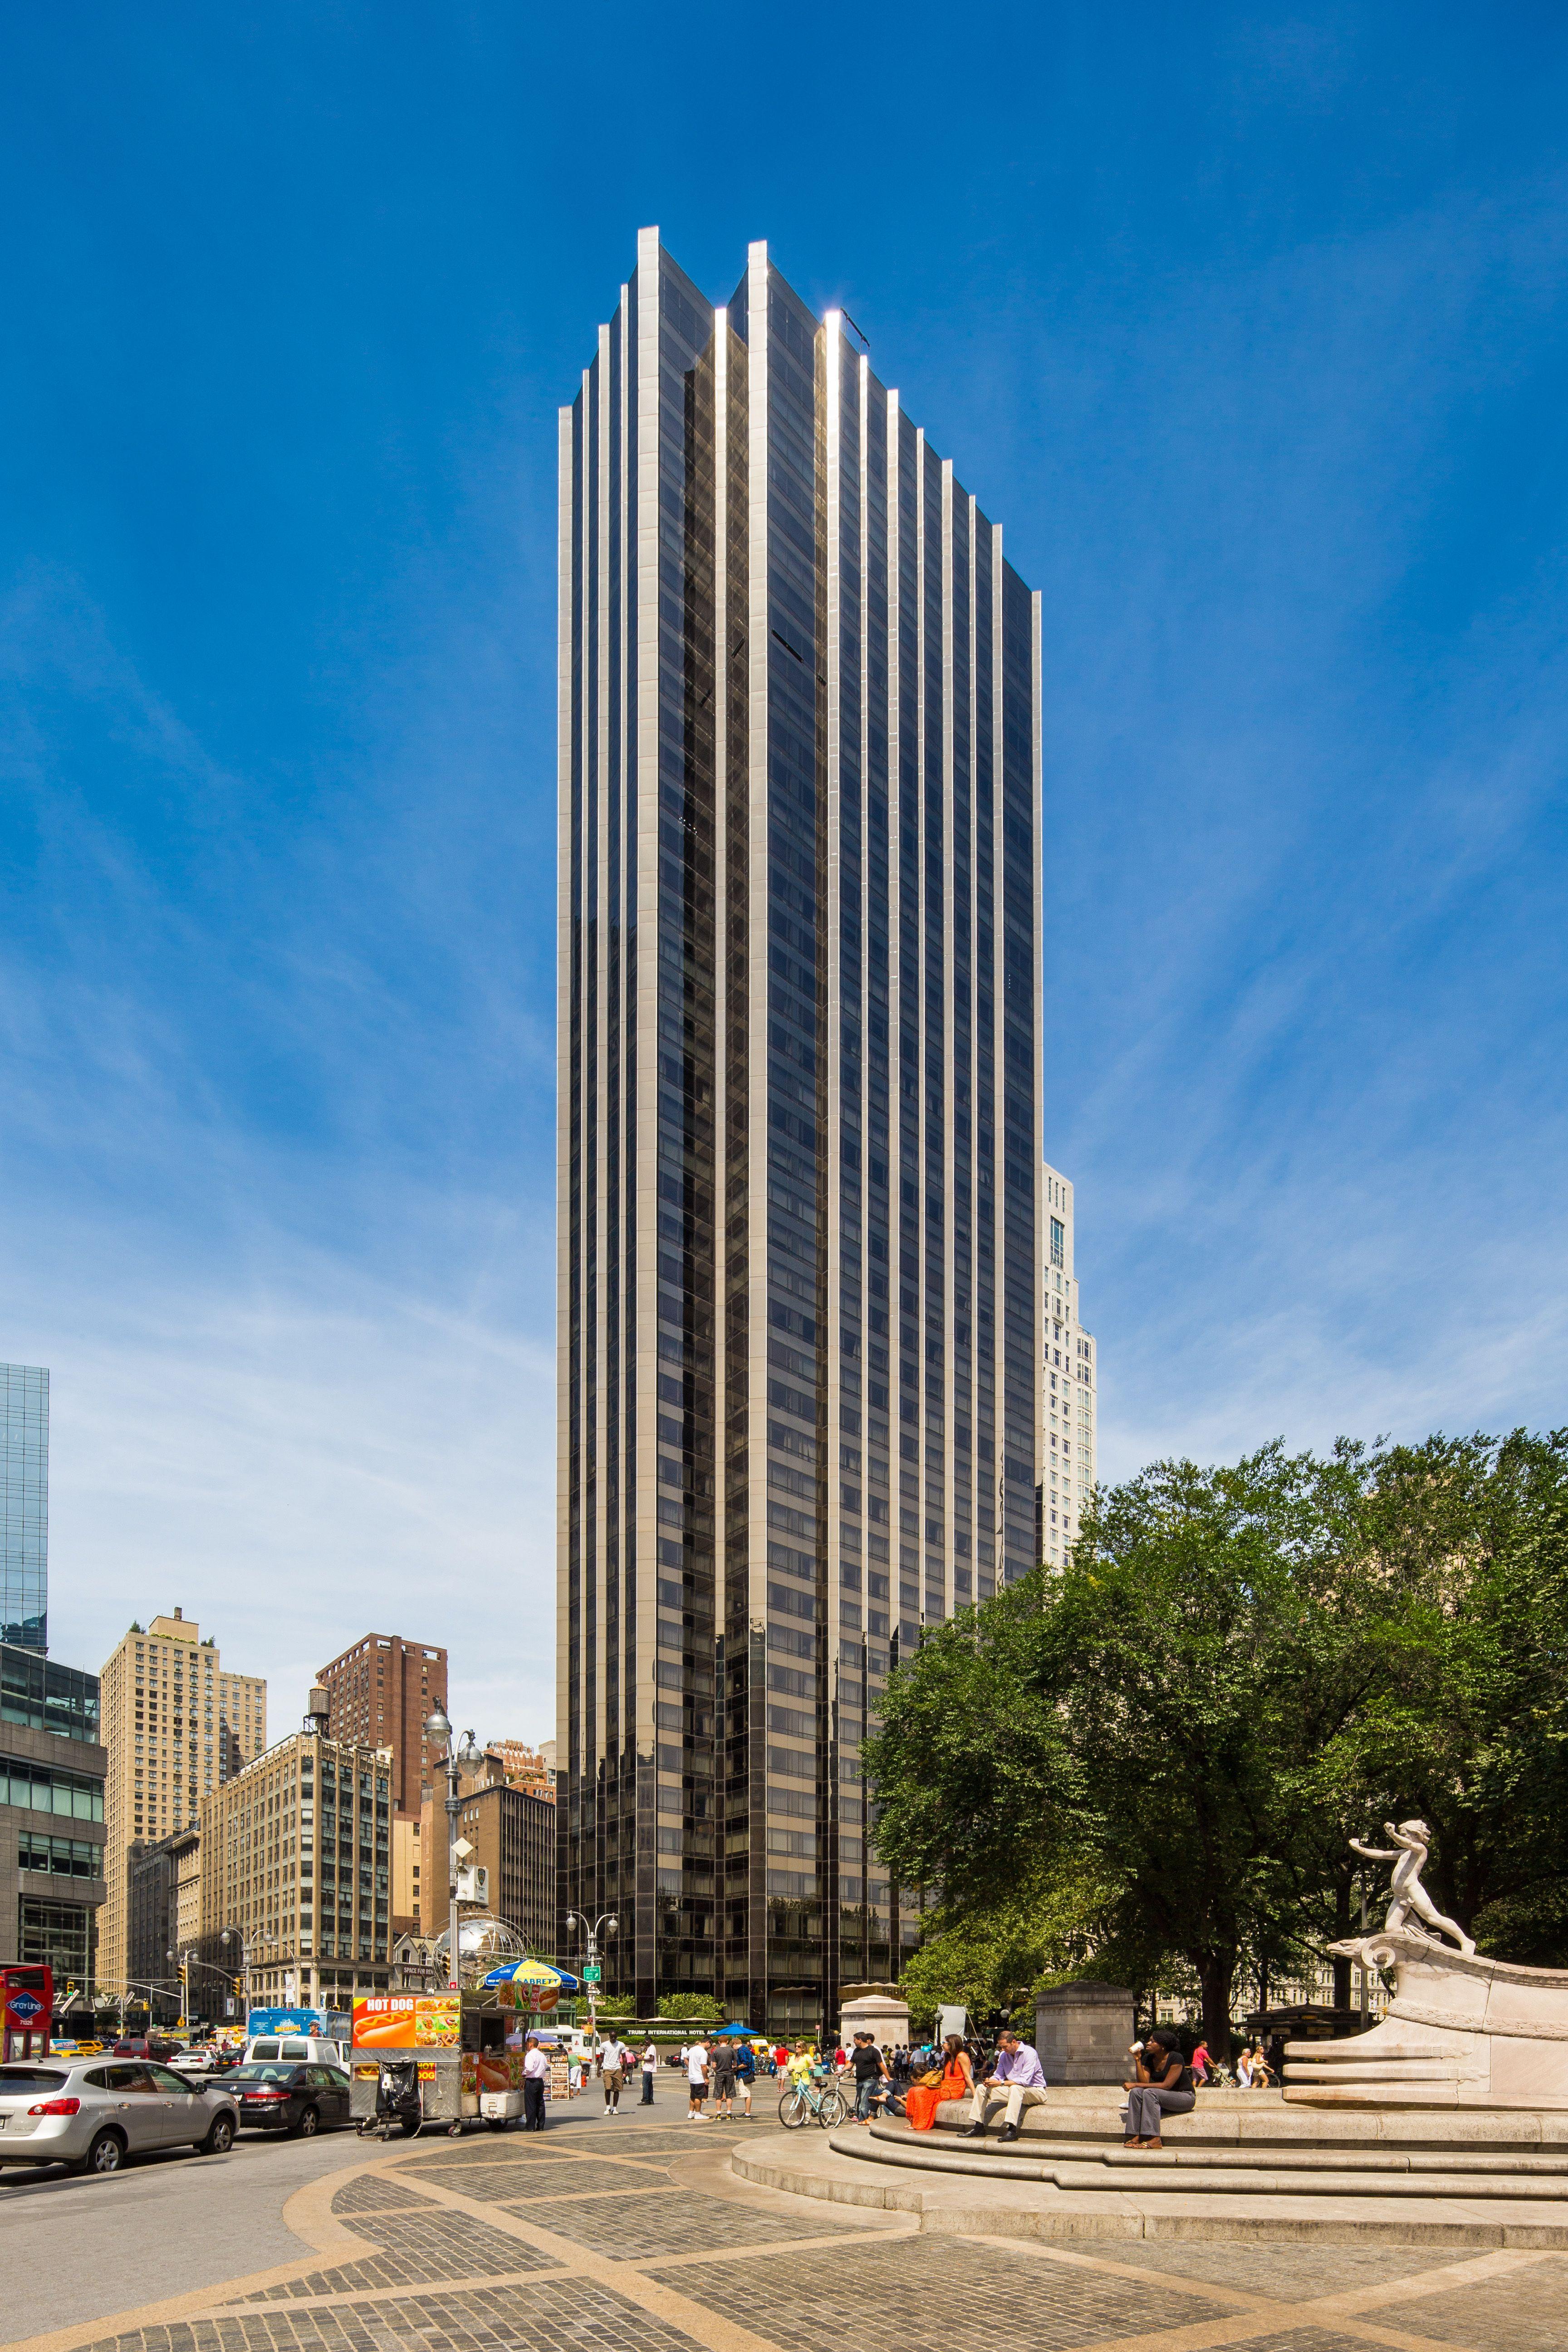 Trump International Hotel & Tower. New York City. New York   Beautiful buildings. Creative architecture. Glass building